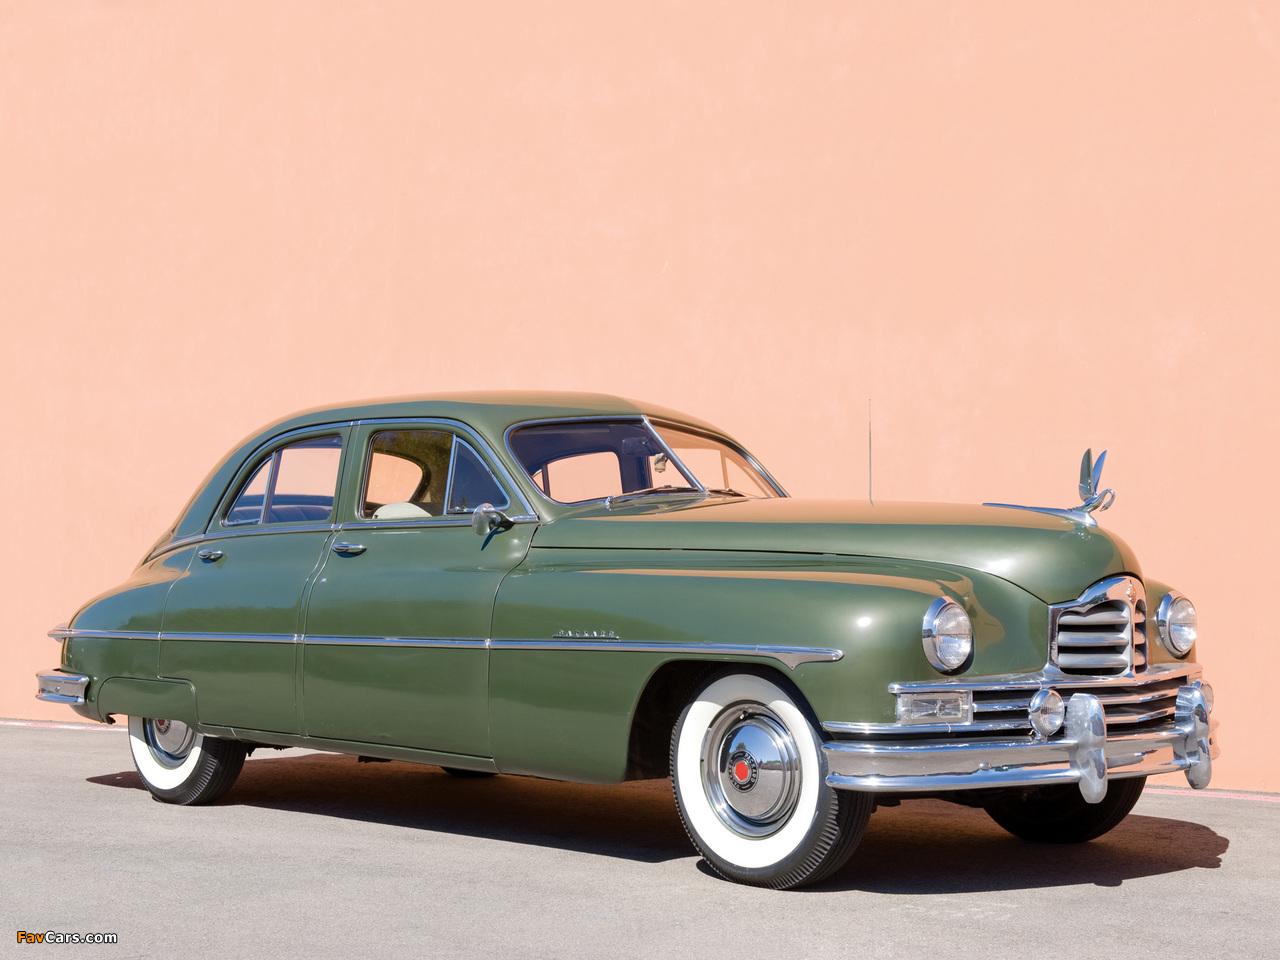 Packard Super Deluxe Eight Touring Sedan 1949 photos (1280 x 960)